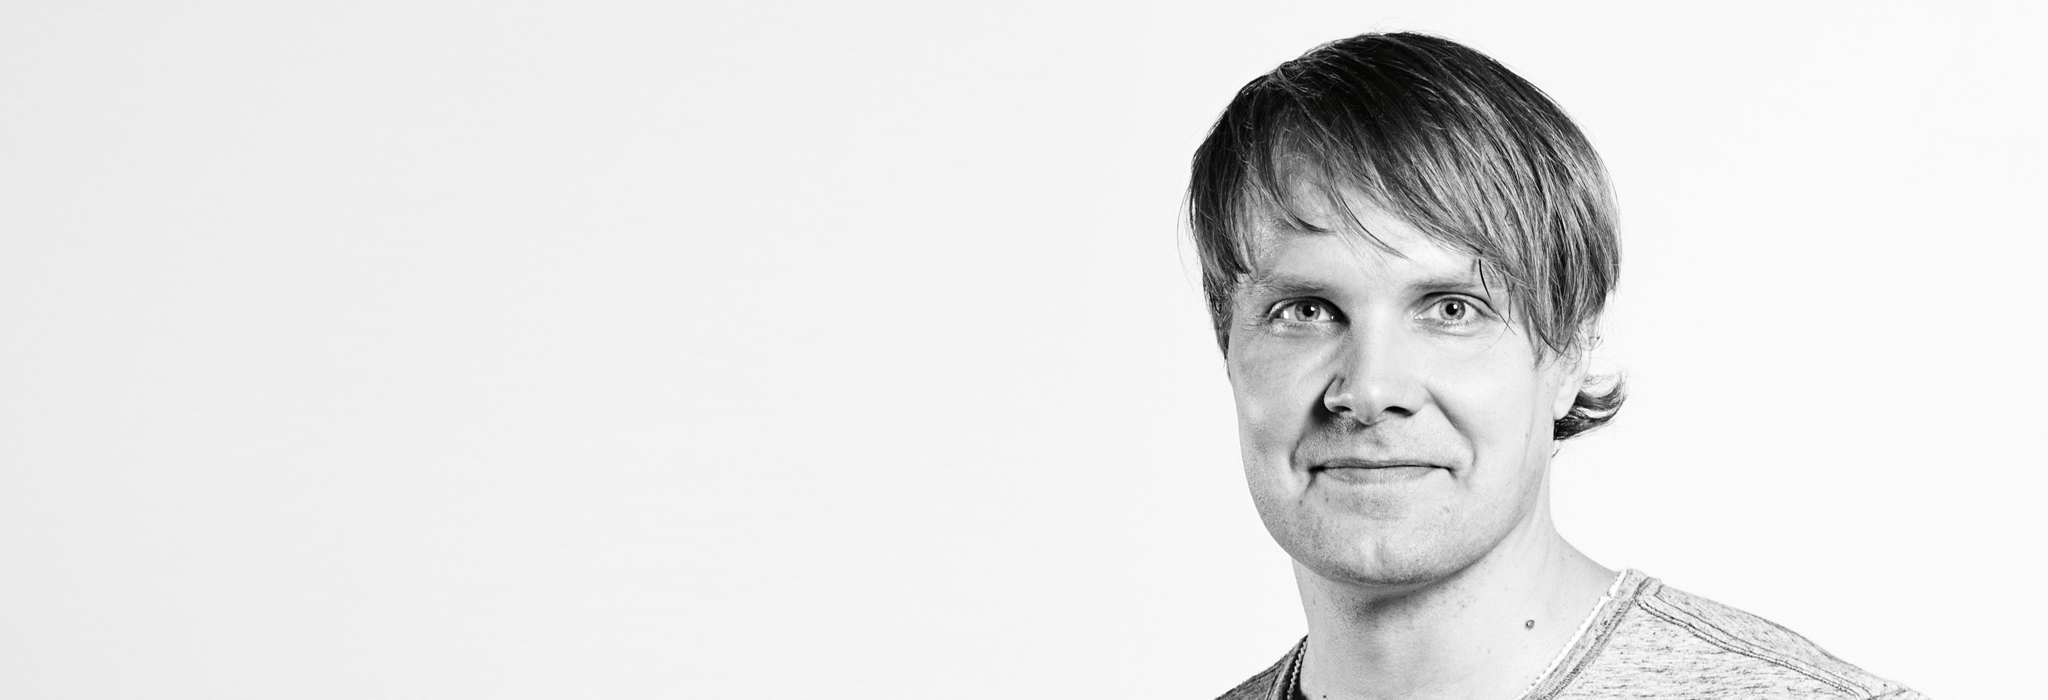 Jarno Härkönen